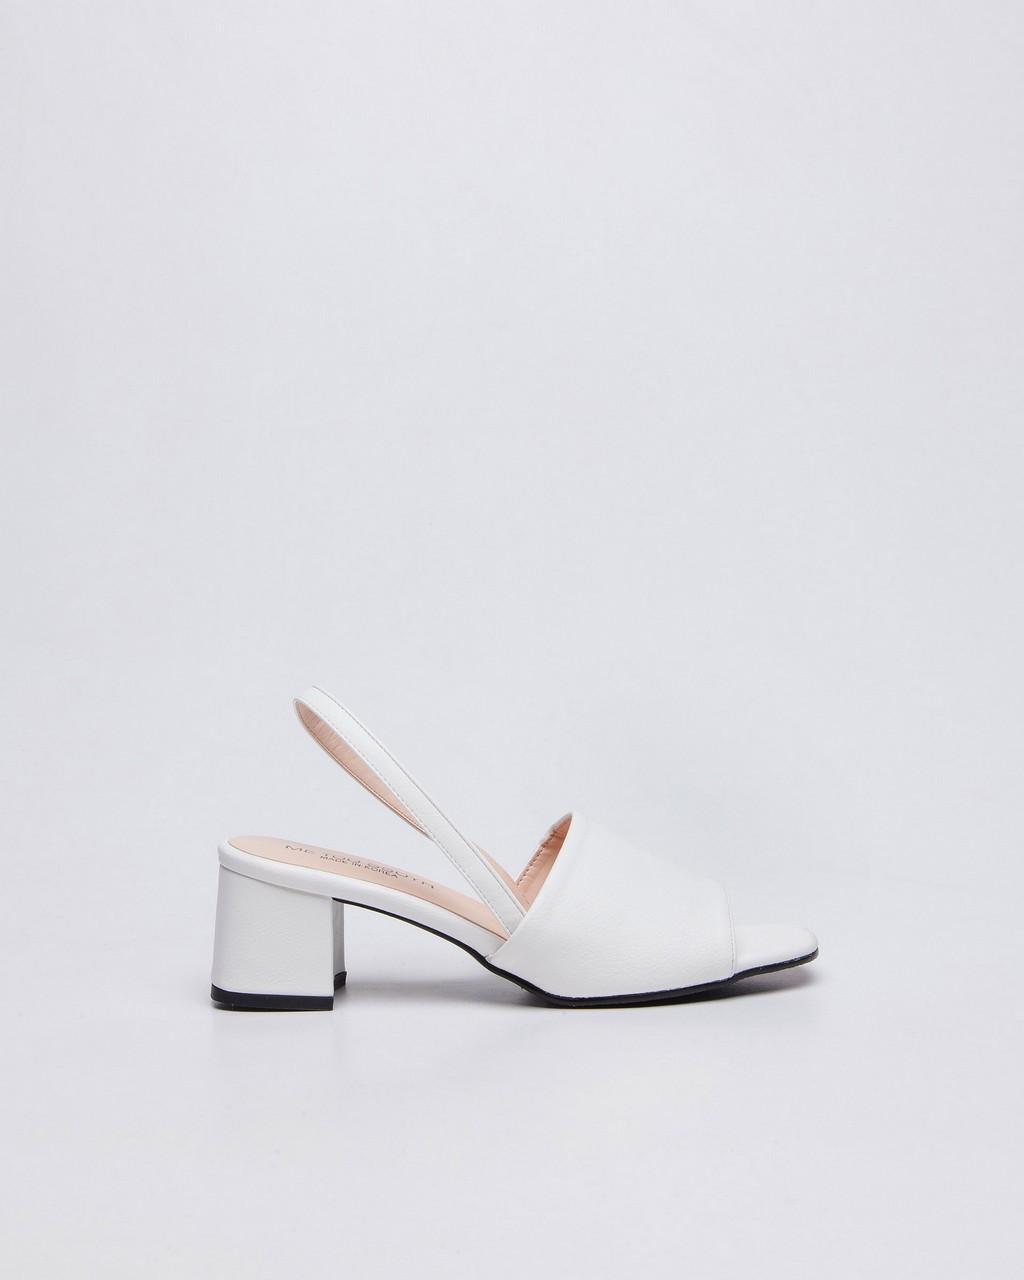 Tagtraume Impose - White(화이트)